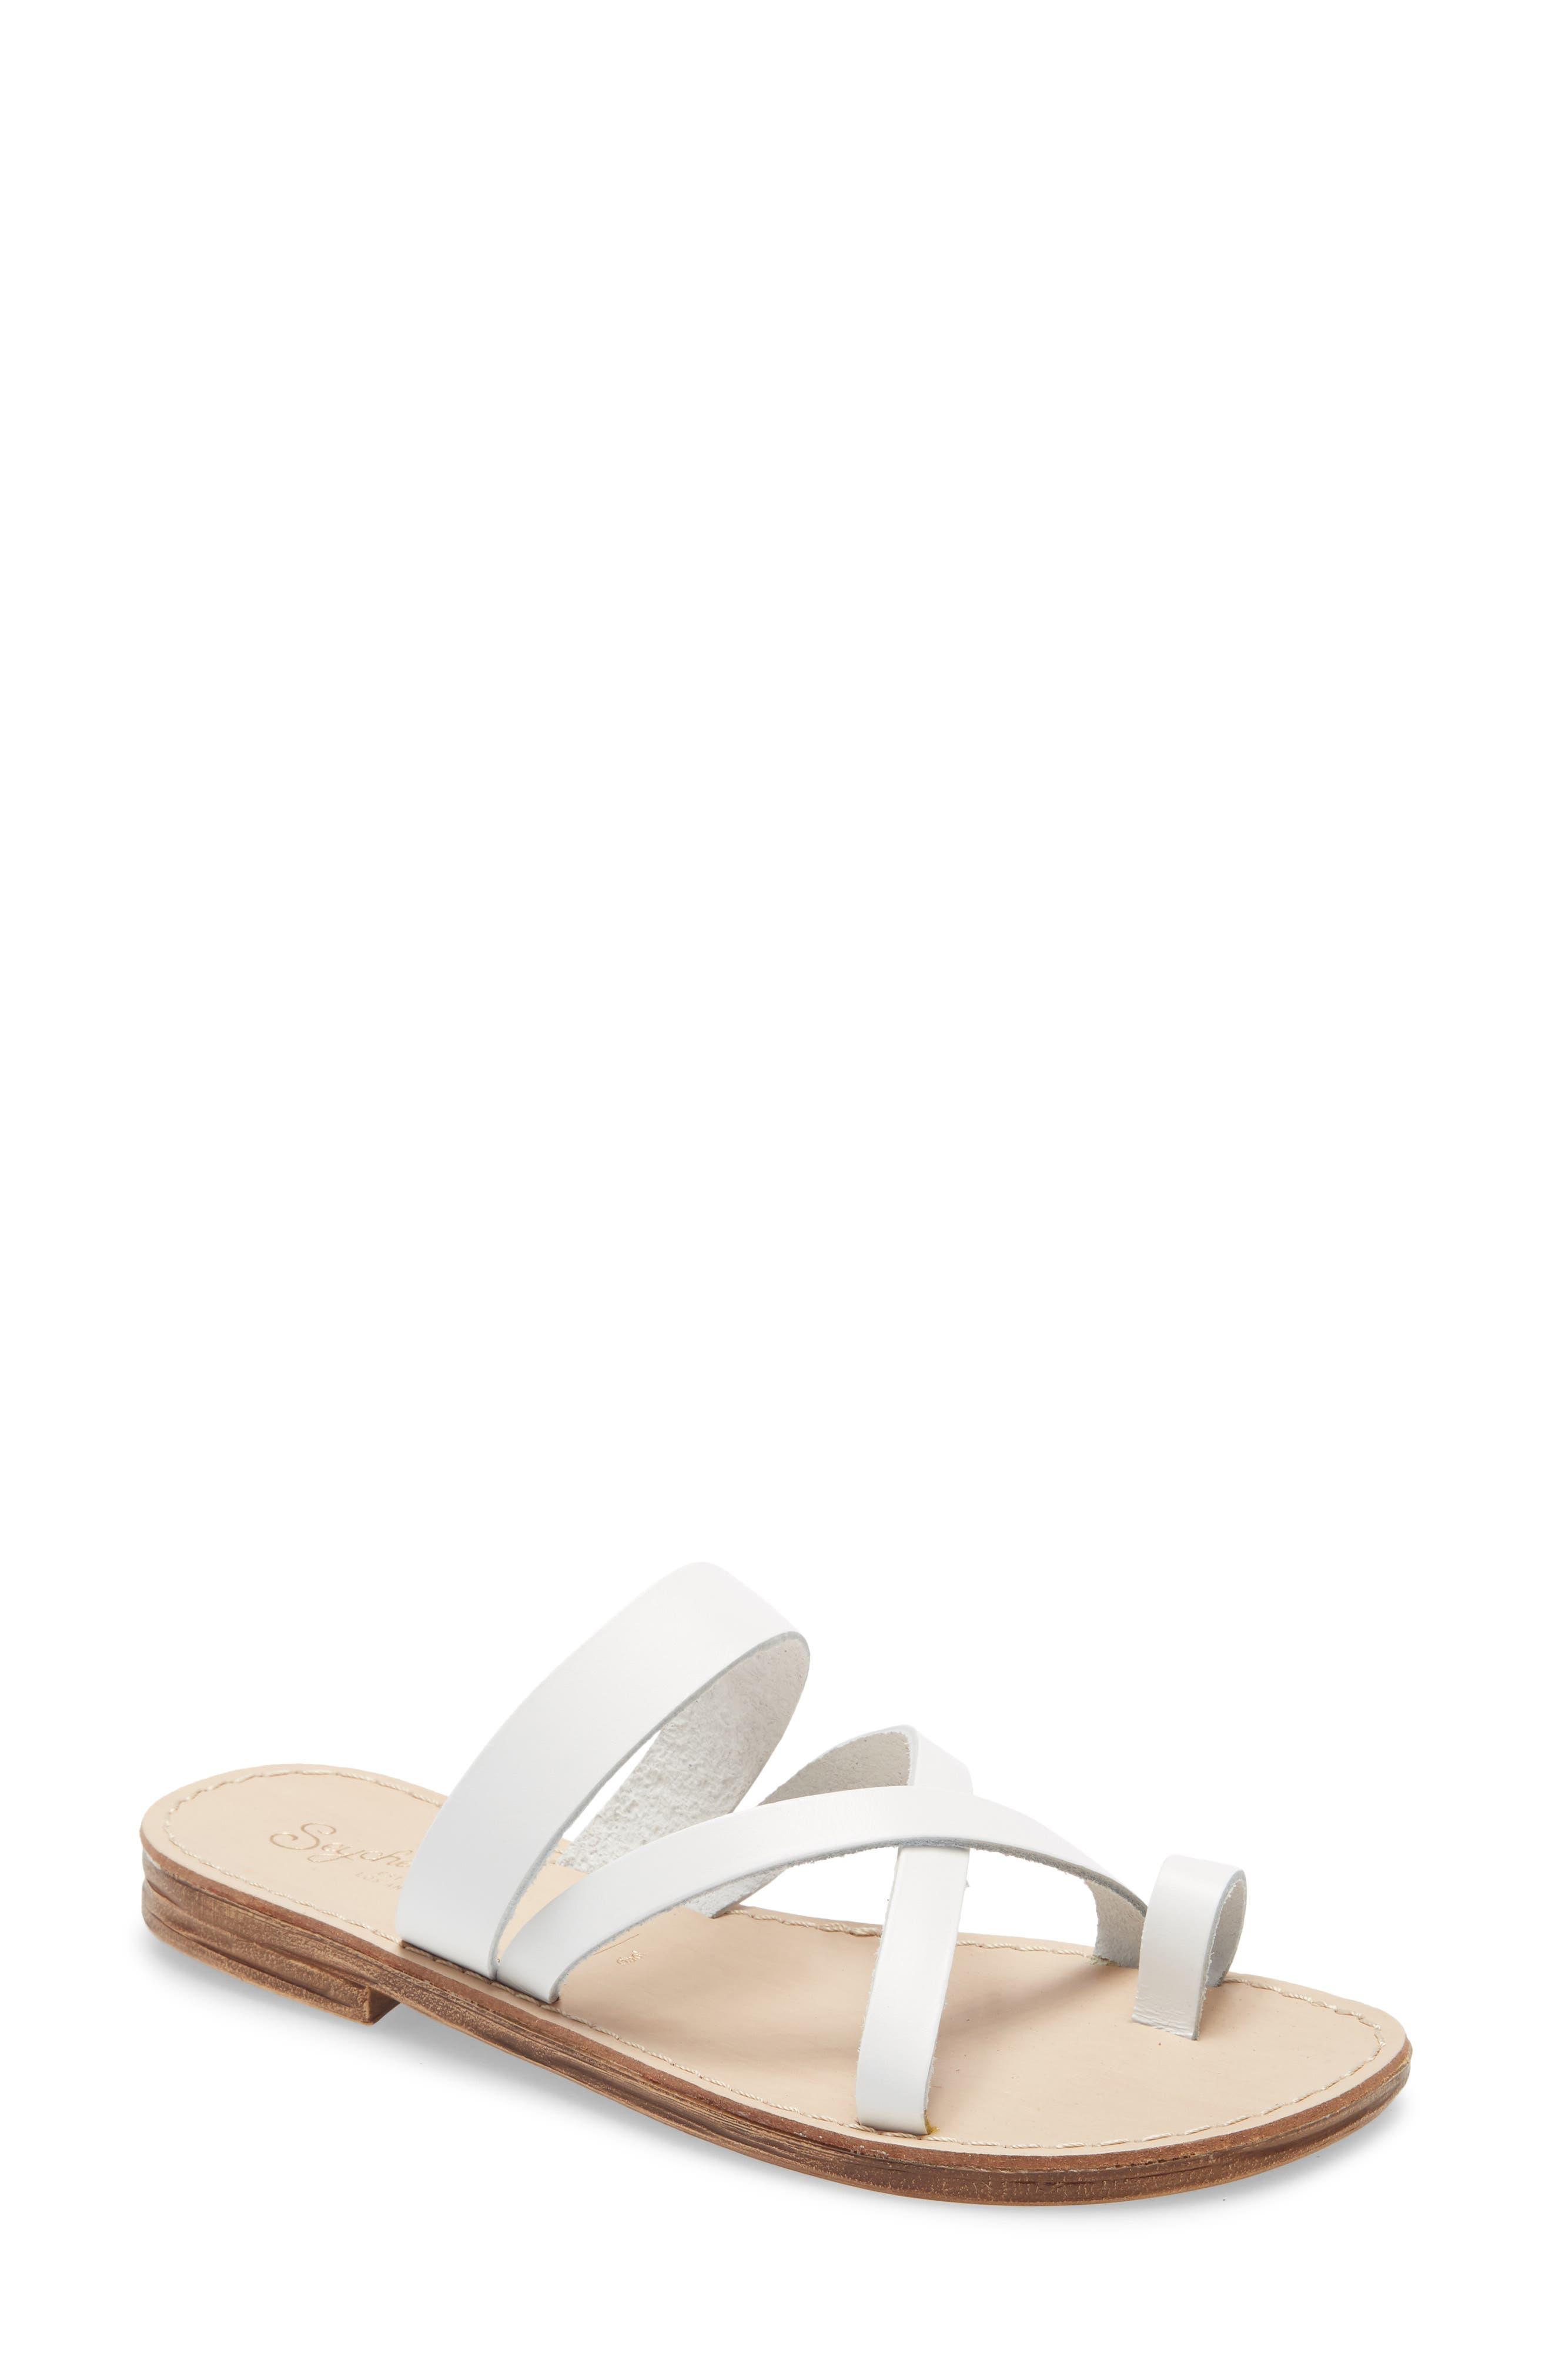 Women's Seychelles Sandals and Flip